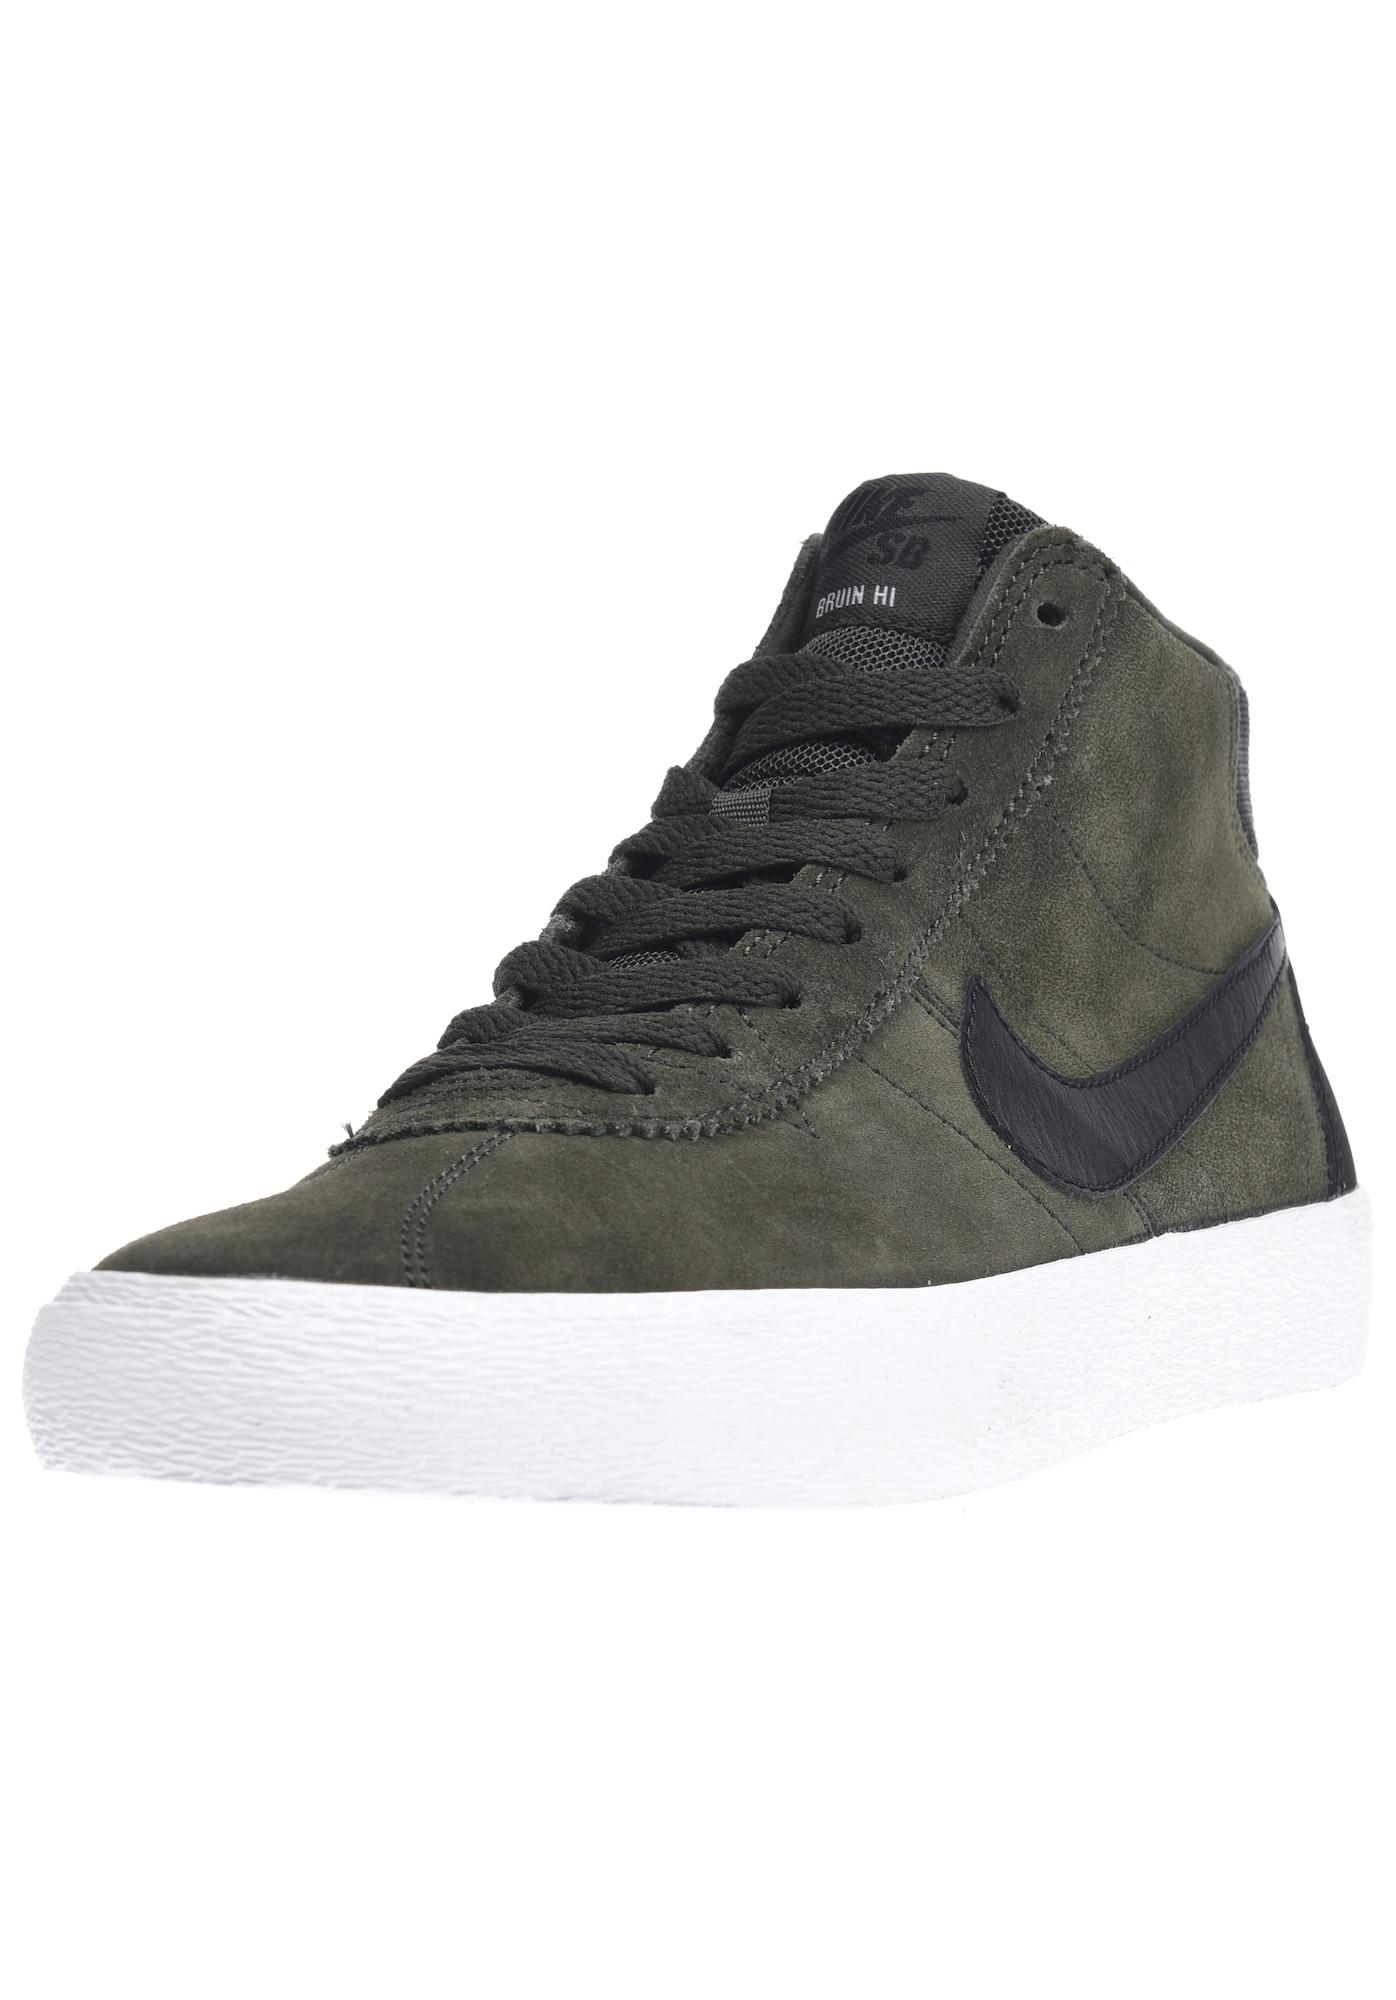 Nike SB, Damen Sneakers hoog Bruin Hi, spar / zwart